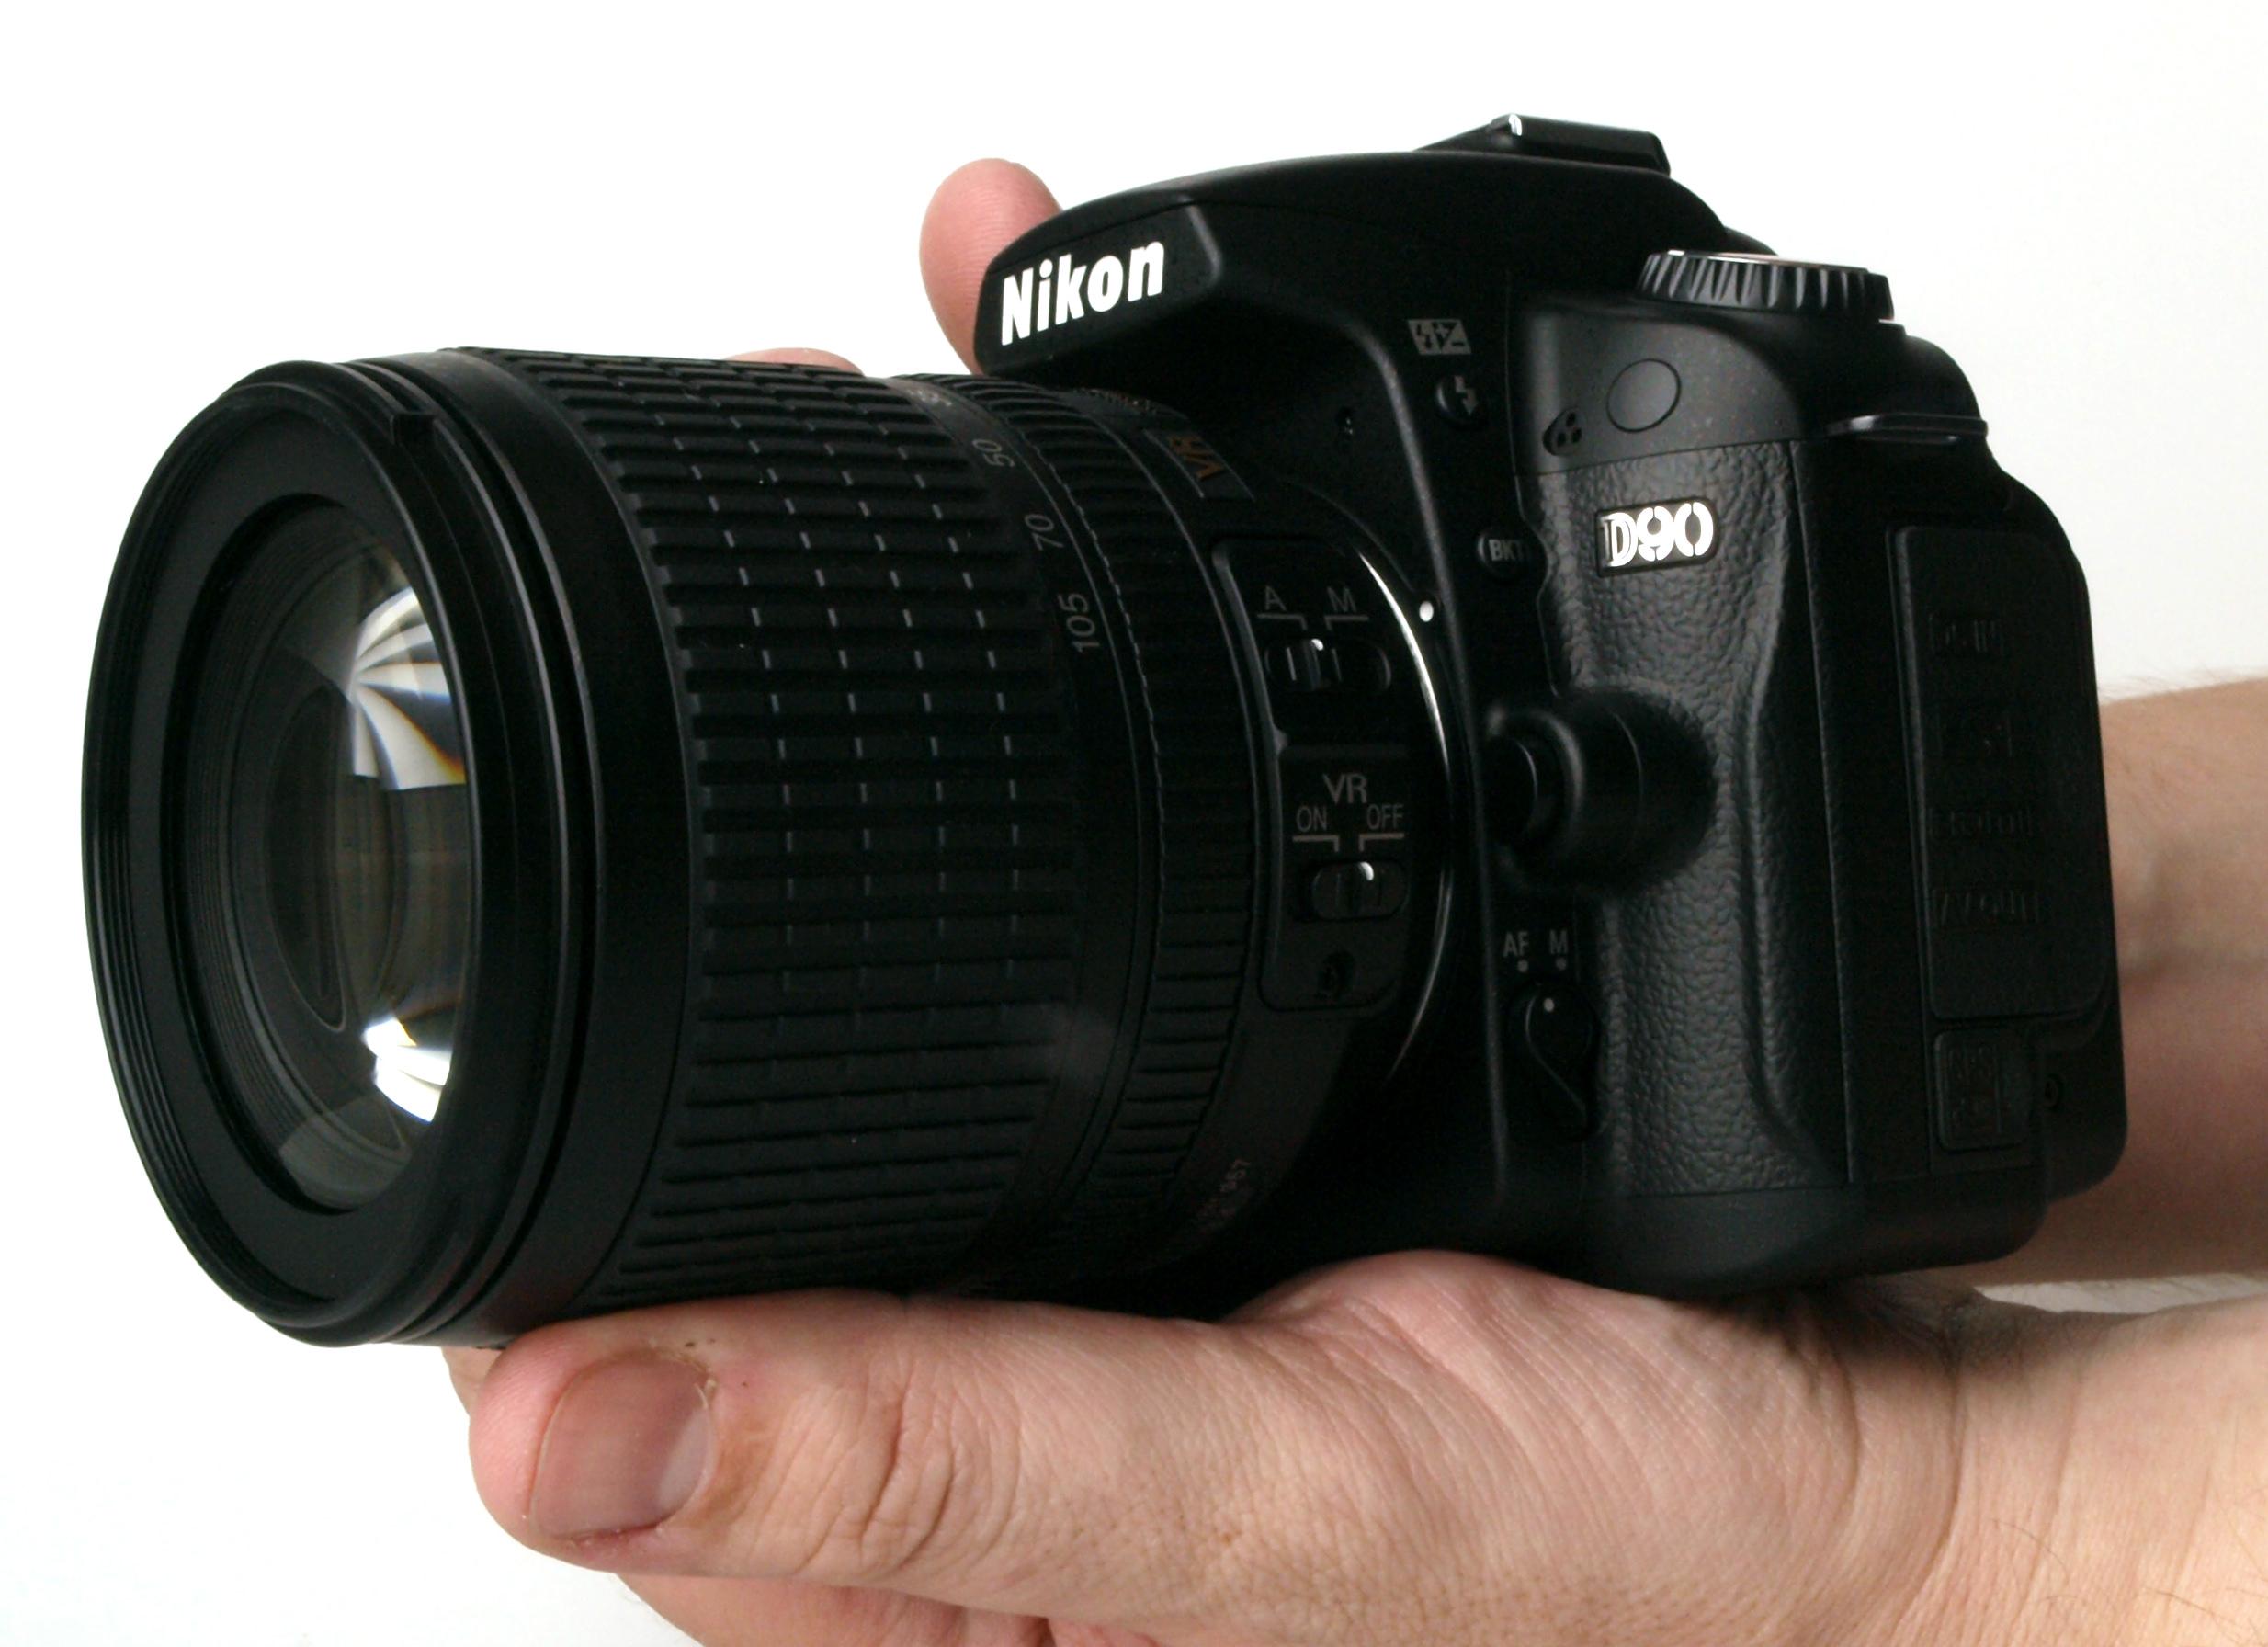 Nikon D90 held